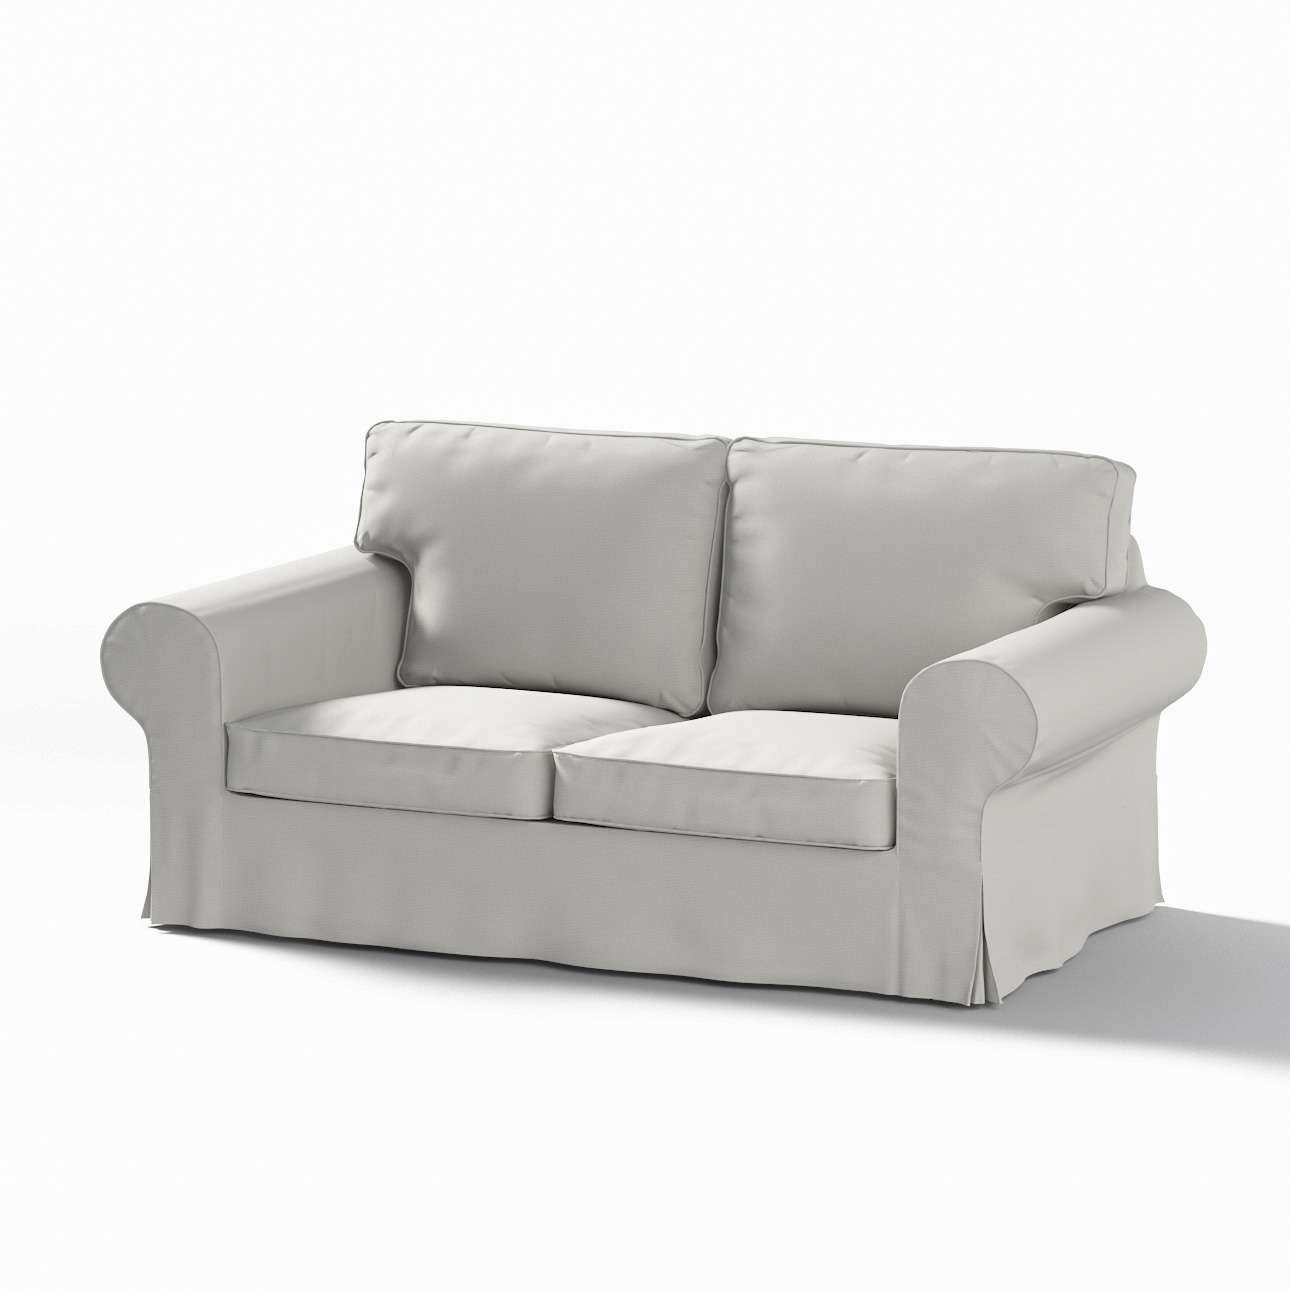 ektorp 2 sitzer schlafsofabezug altes modell hellgrau dekoria. Black Bedroom Furniture Sets. Home Design Ideas